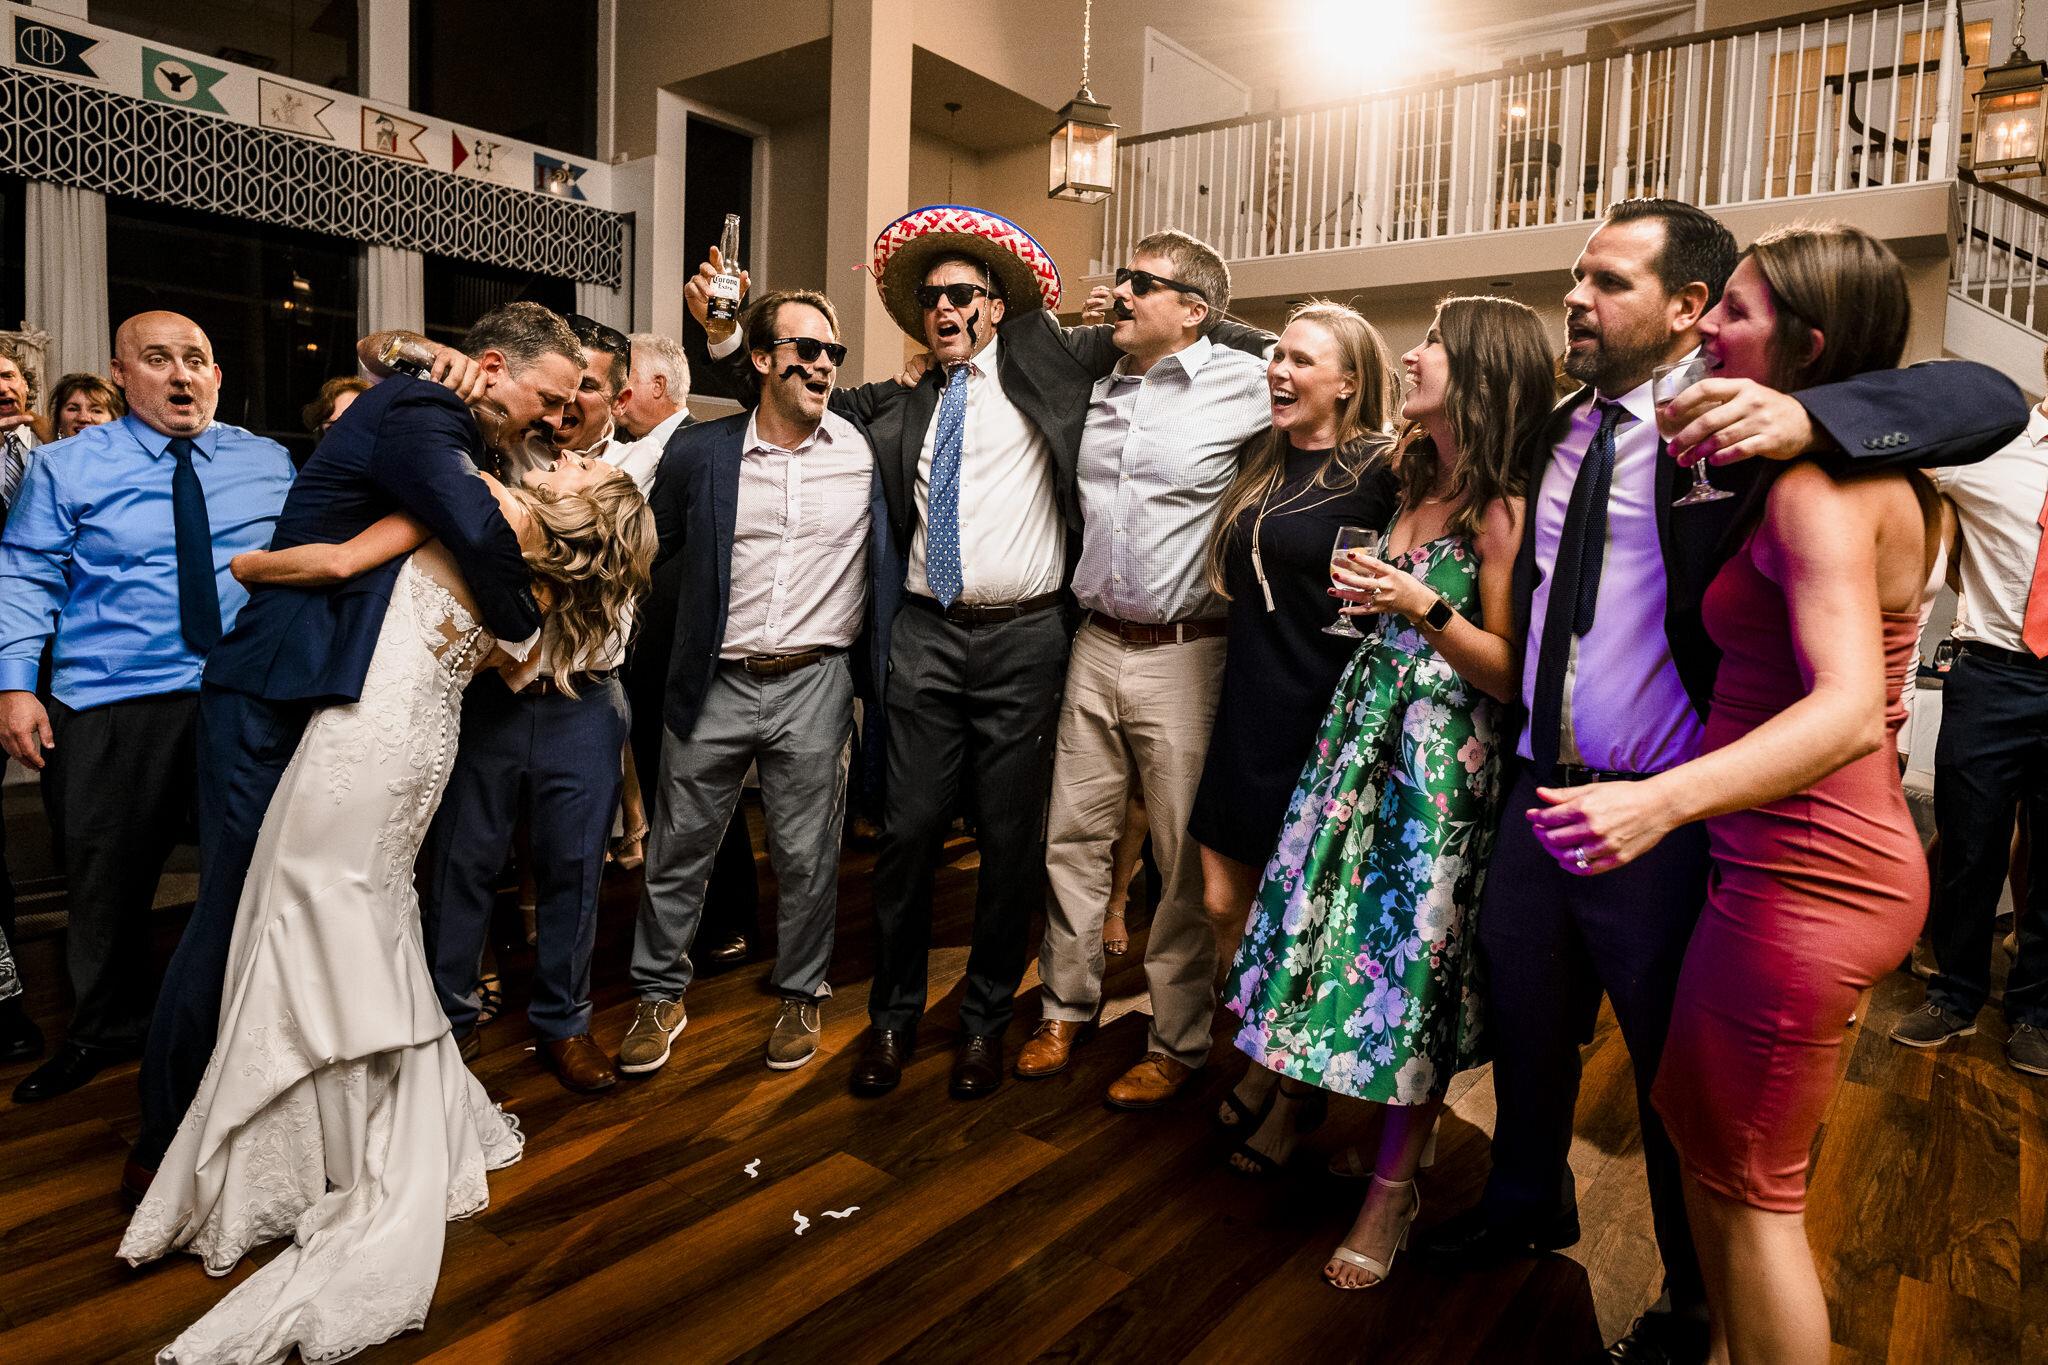 Snell-Ocean-City-Yacht-Club-New-Jersey-Wedding-Photographer-49.JPG